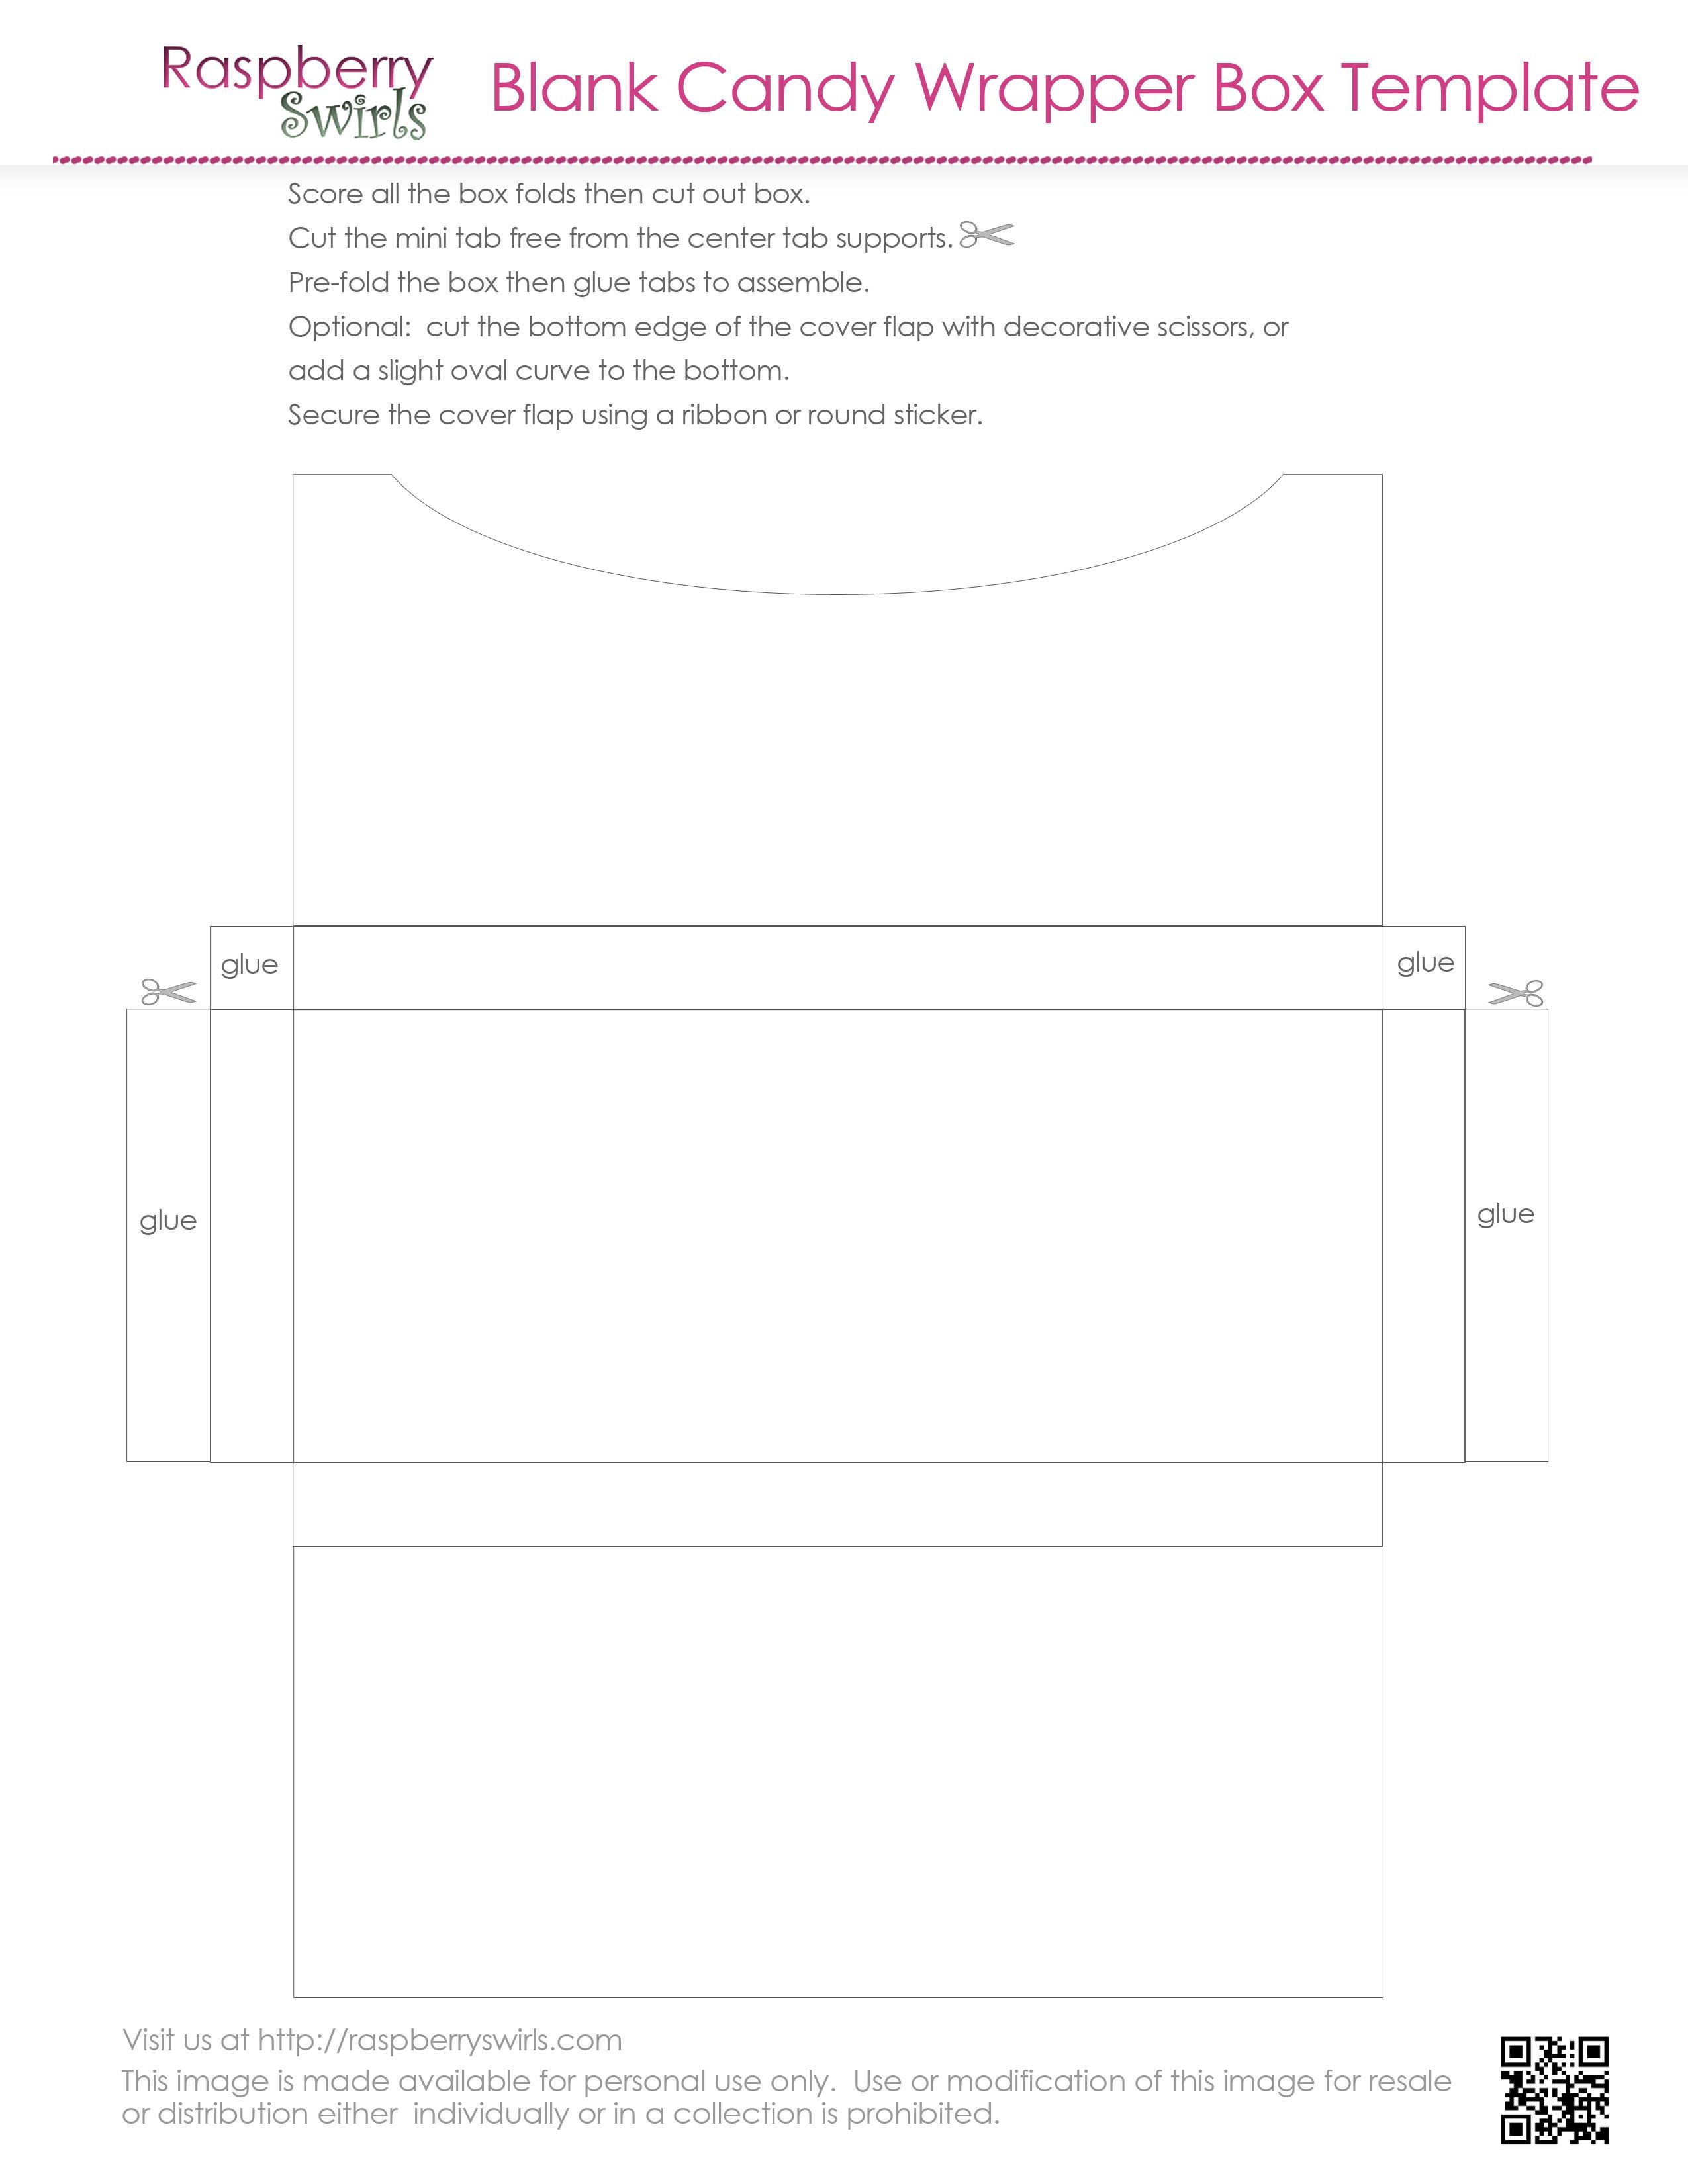 Free Printable Chocolate Candy Bar Wrapper Box Template Raspberry Swirls